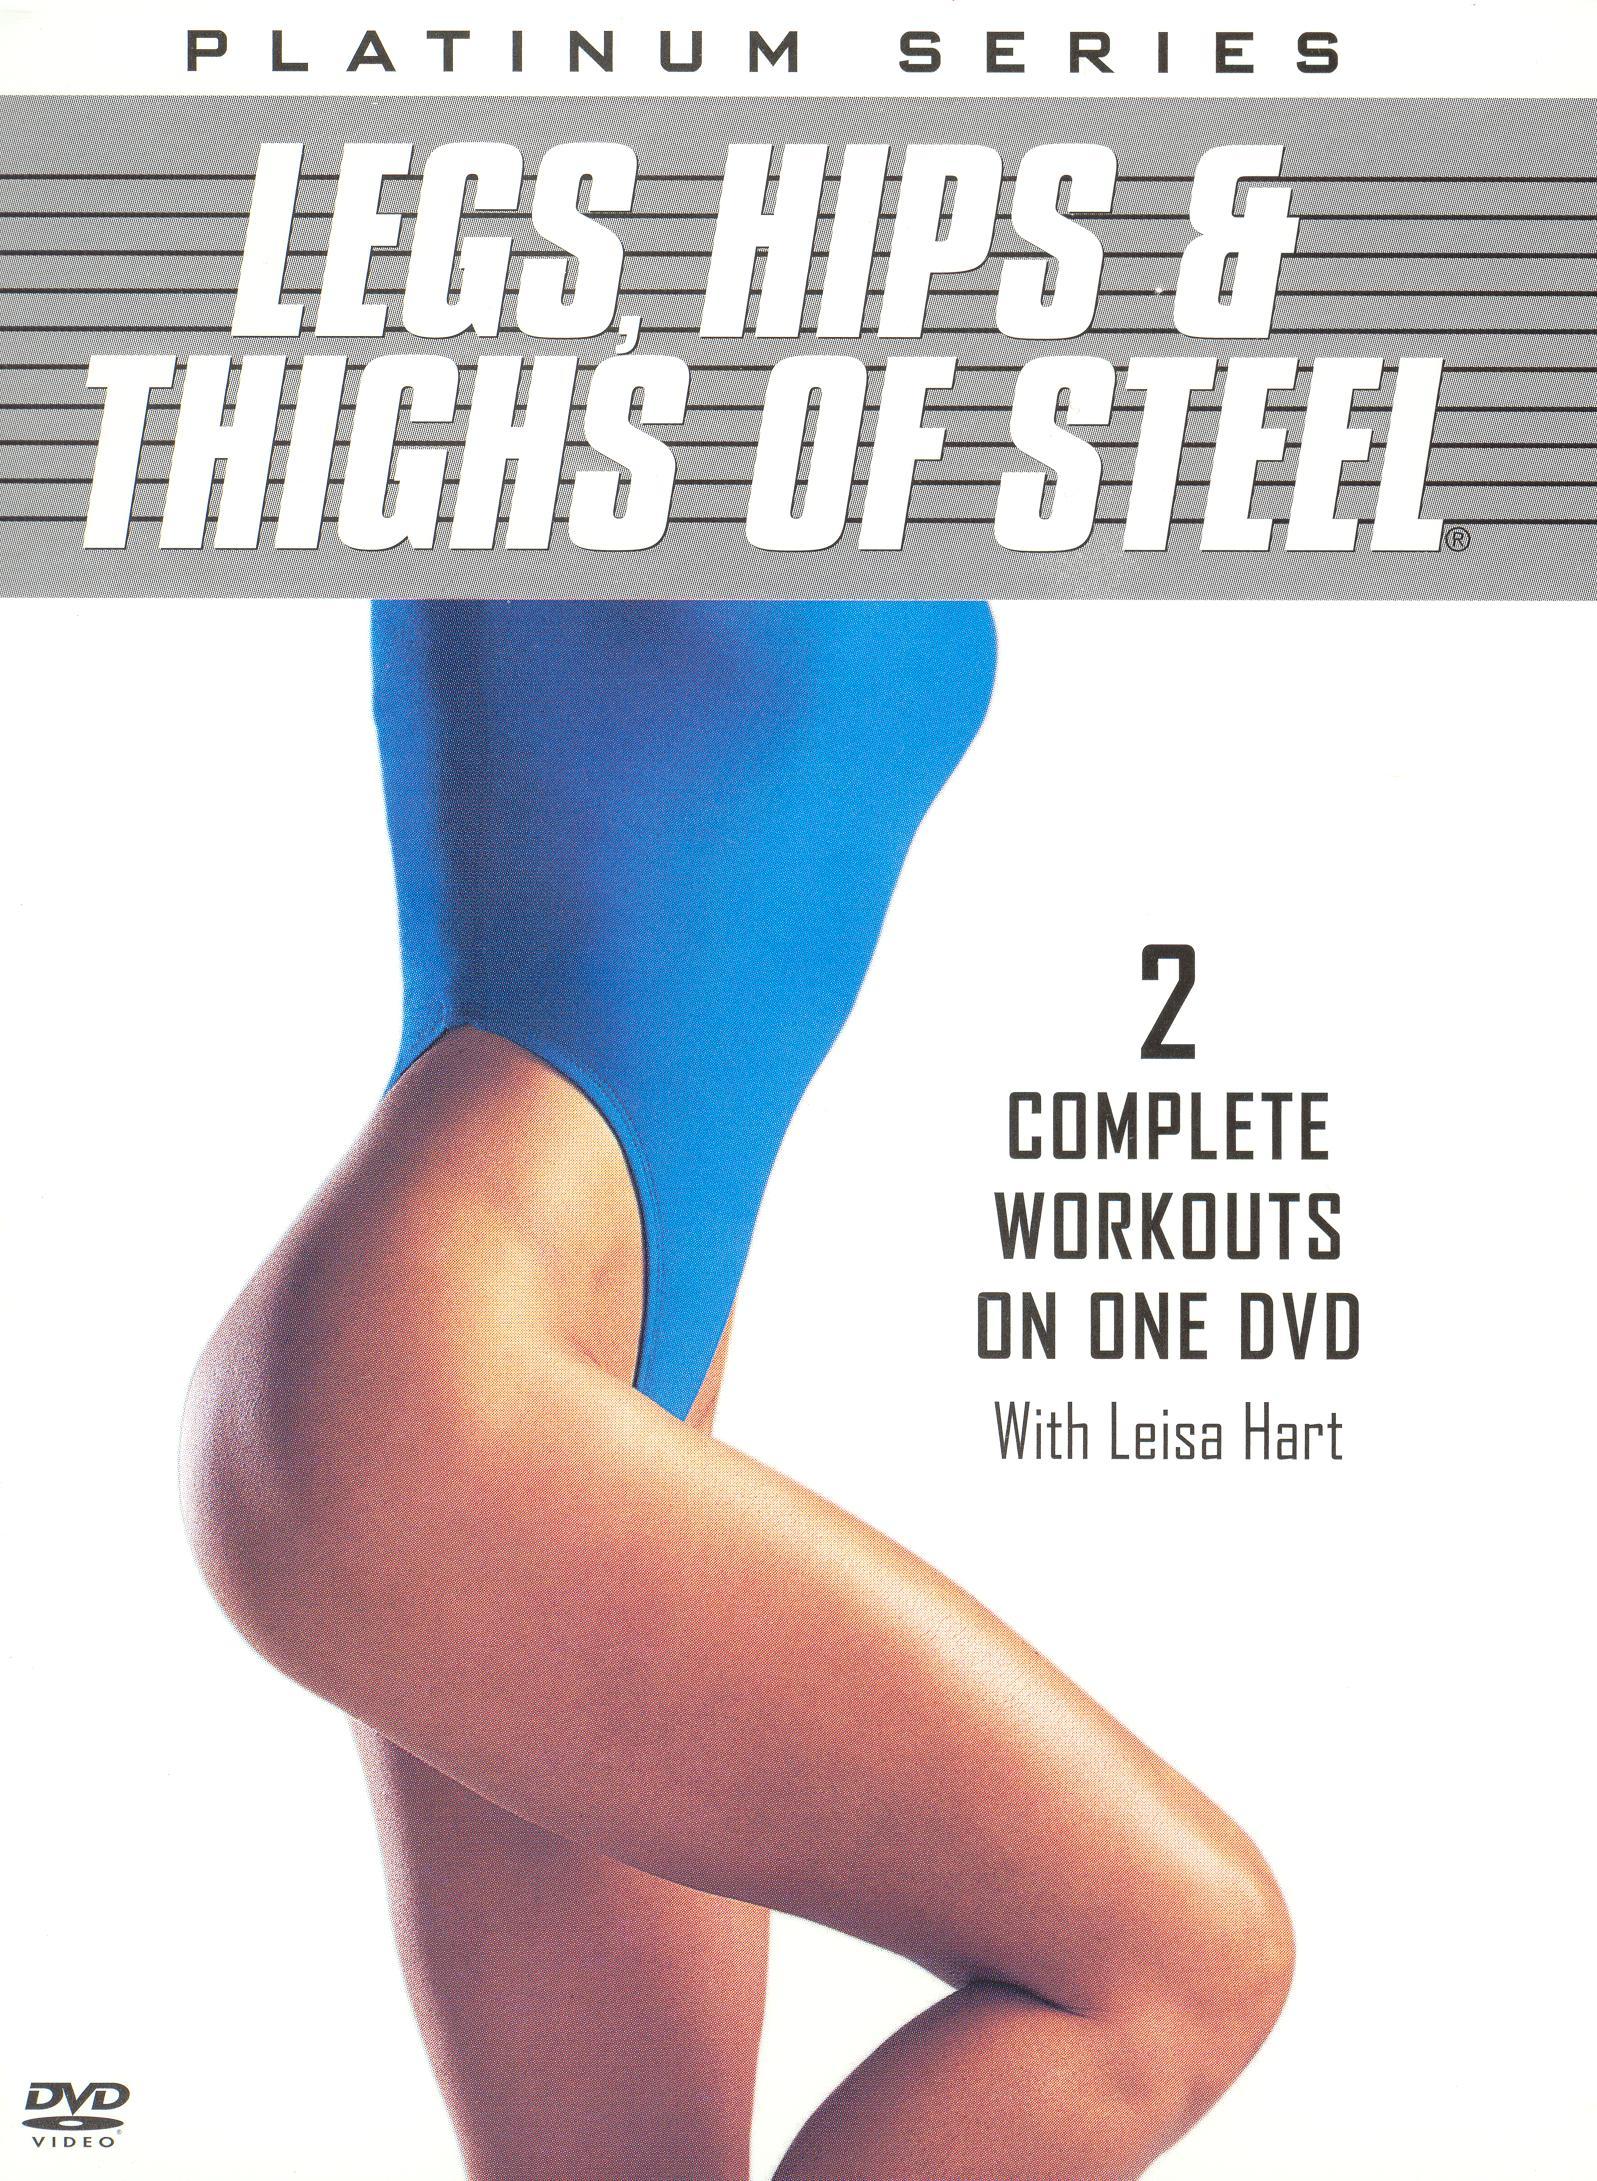 Leisa Hart: Platinum Series - Legs, Hips and Thighs of Steel